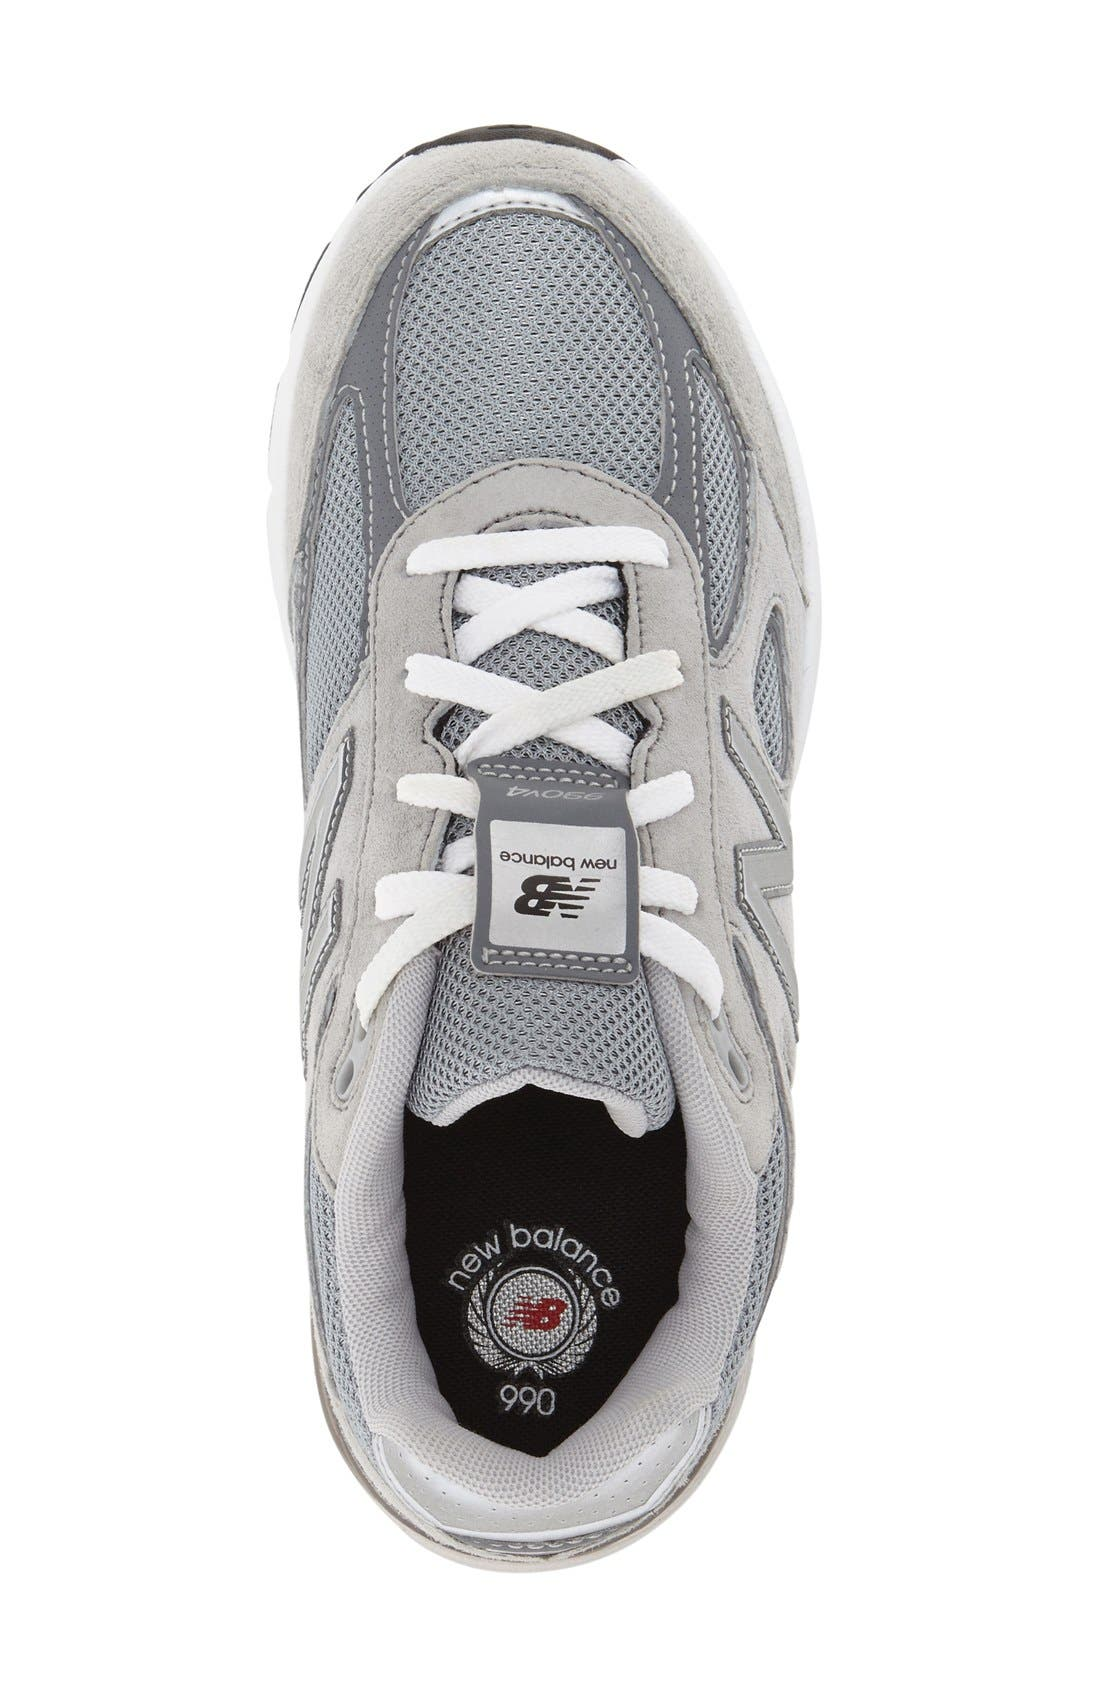 '990 Medi' Sneaker,                             Alternate thumbnail 2, color,                             030